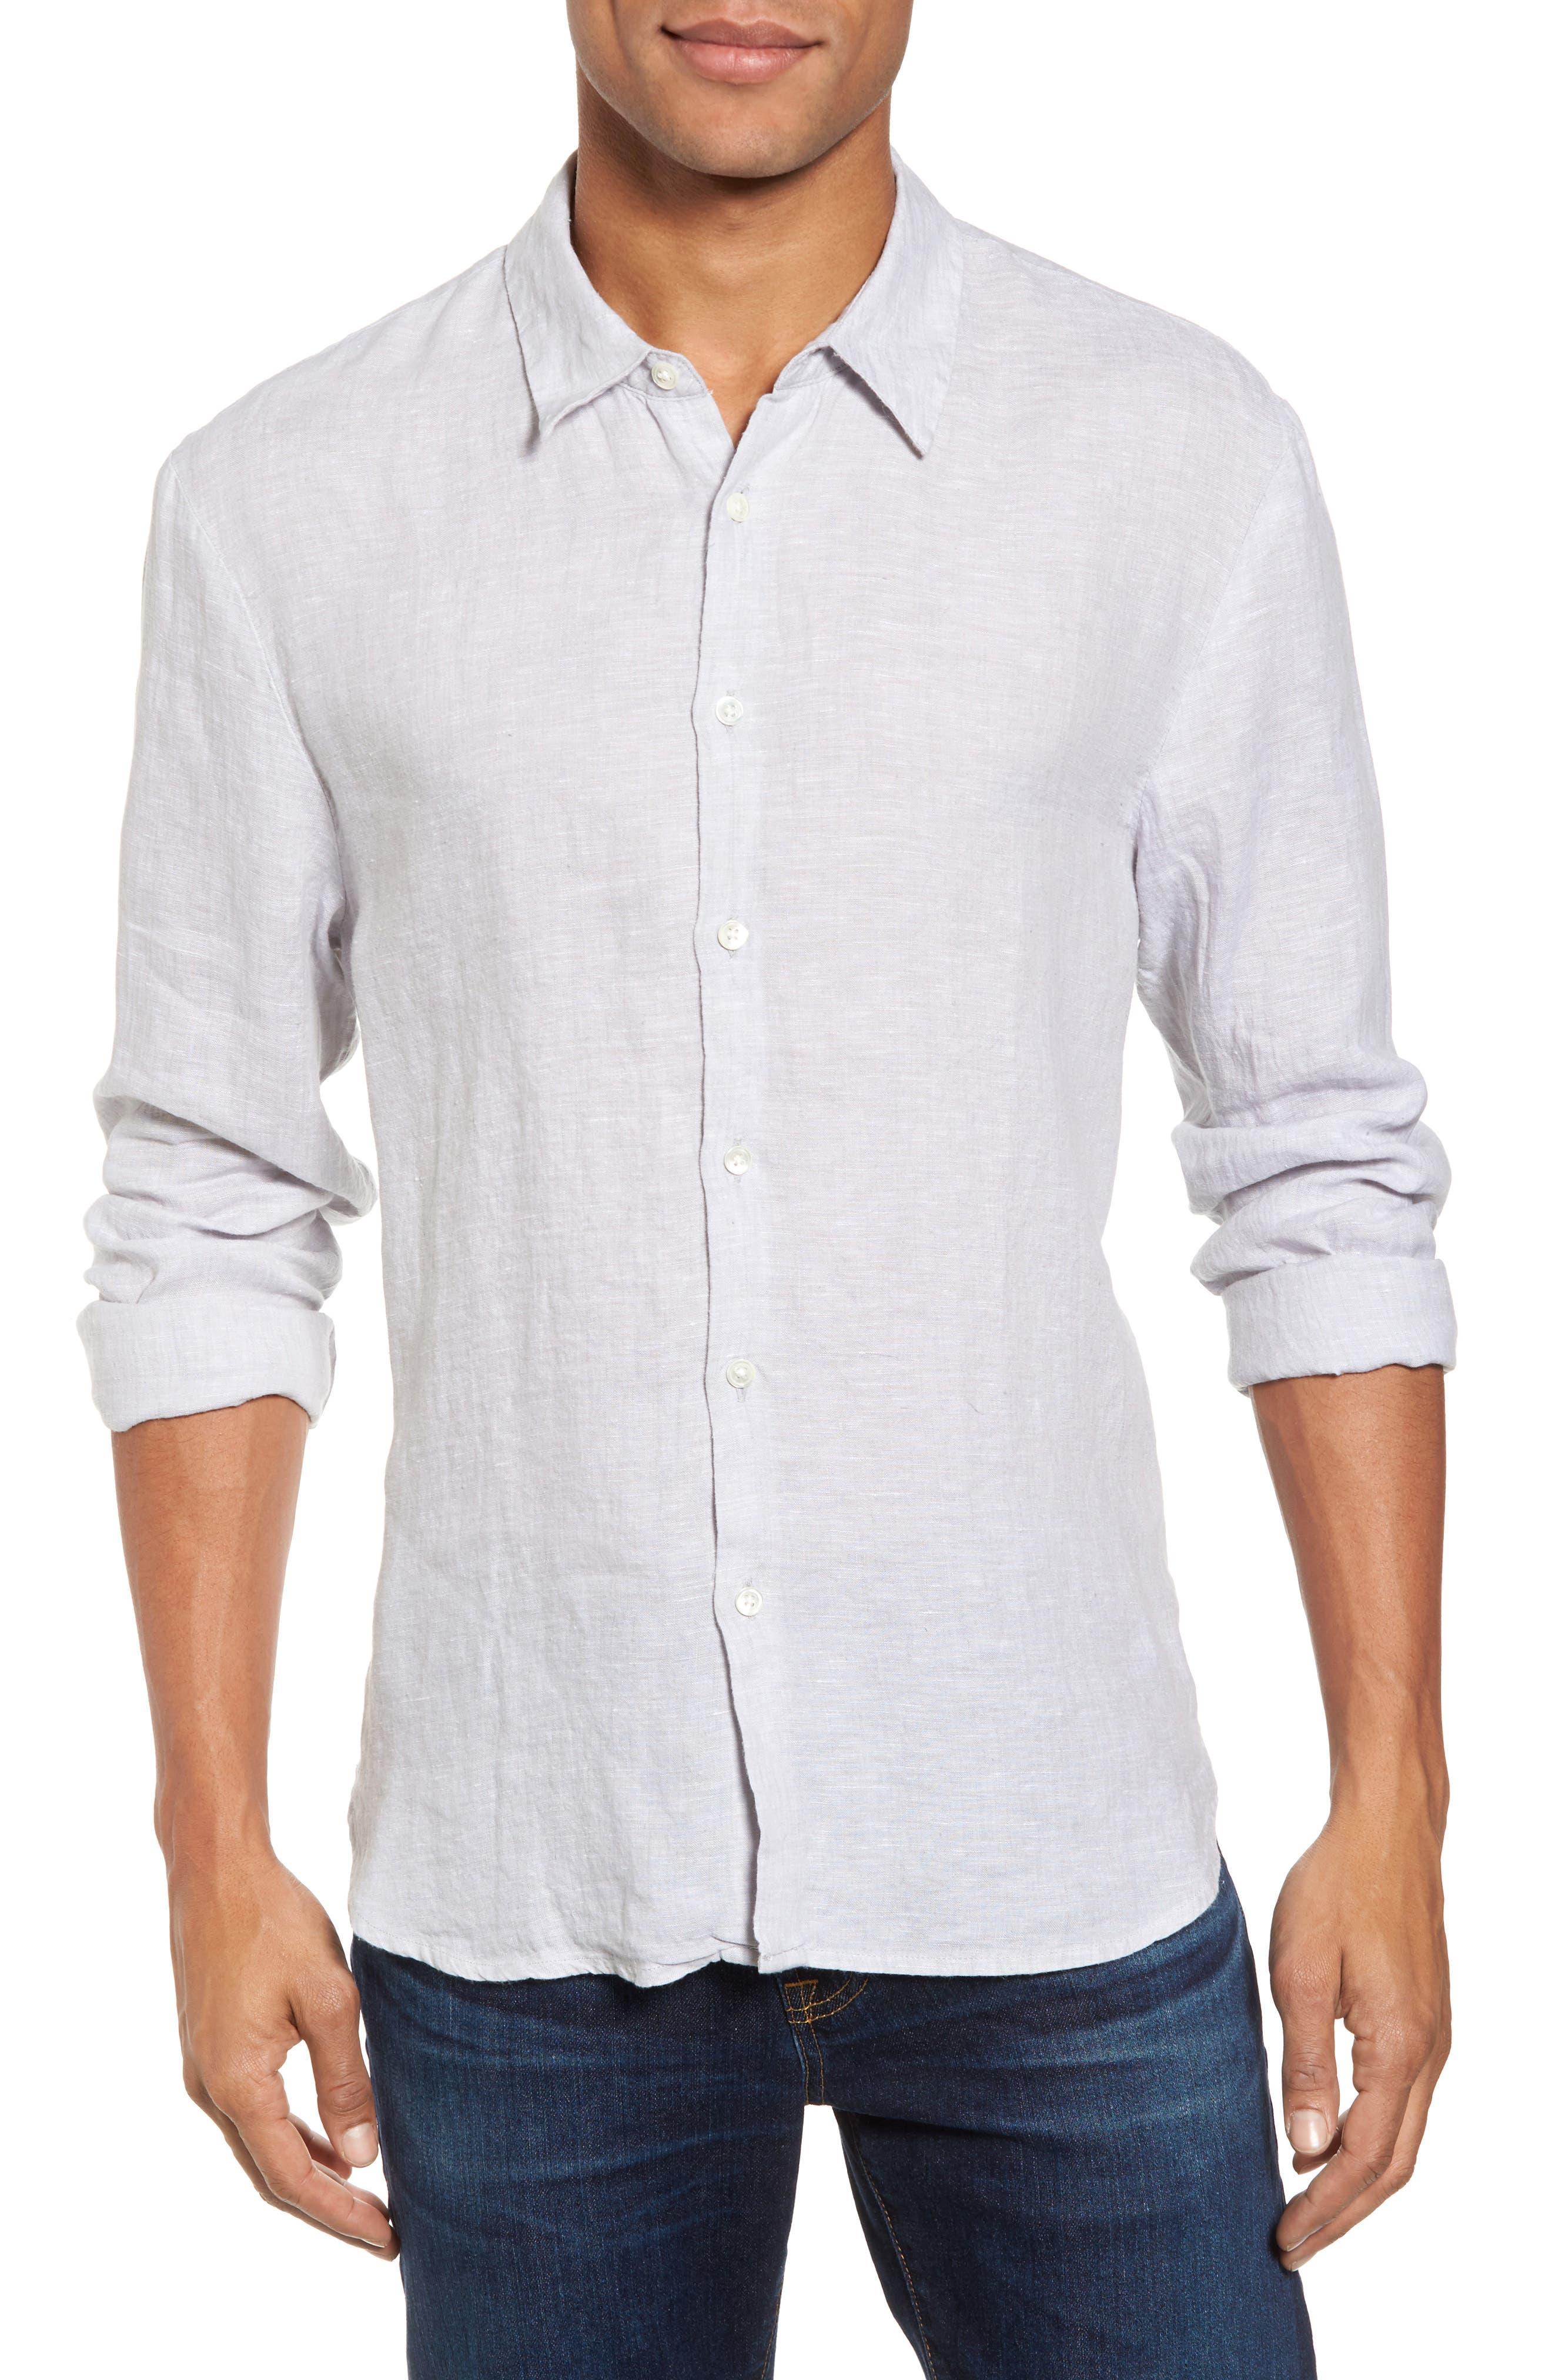 Alternate Image 1 Selected - James Perse Slim Fit Linen Sport Shirt